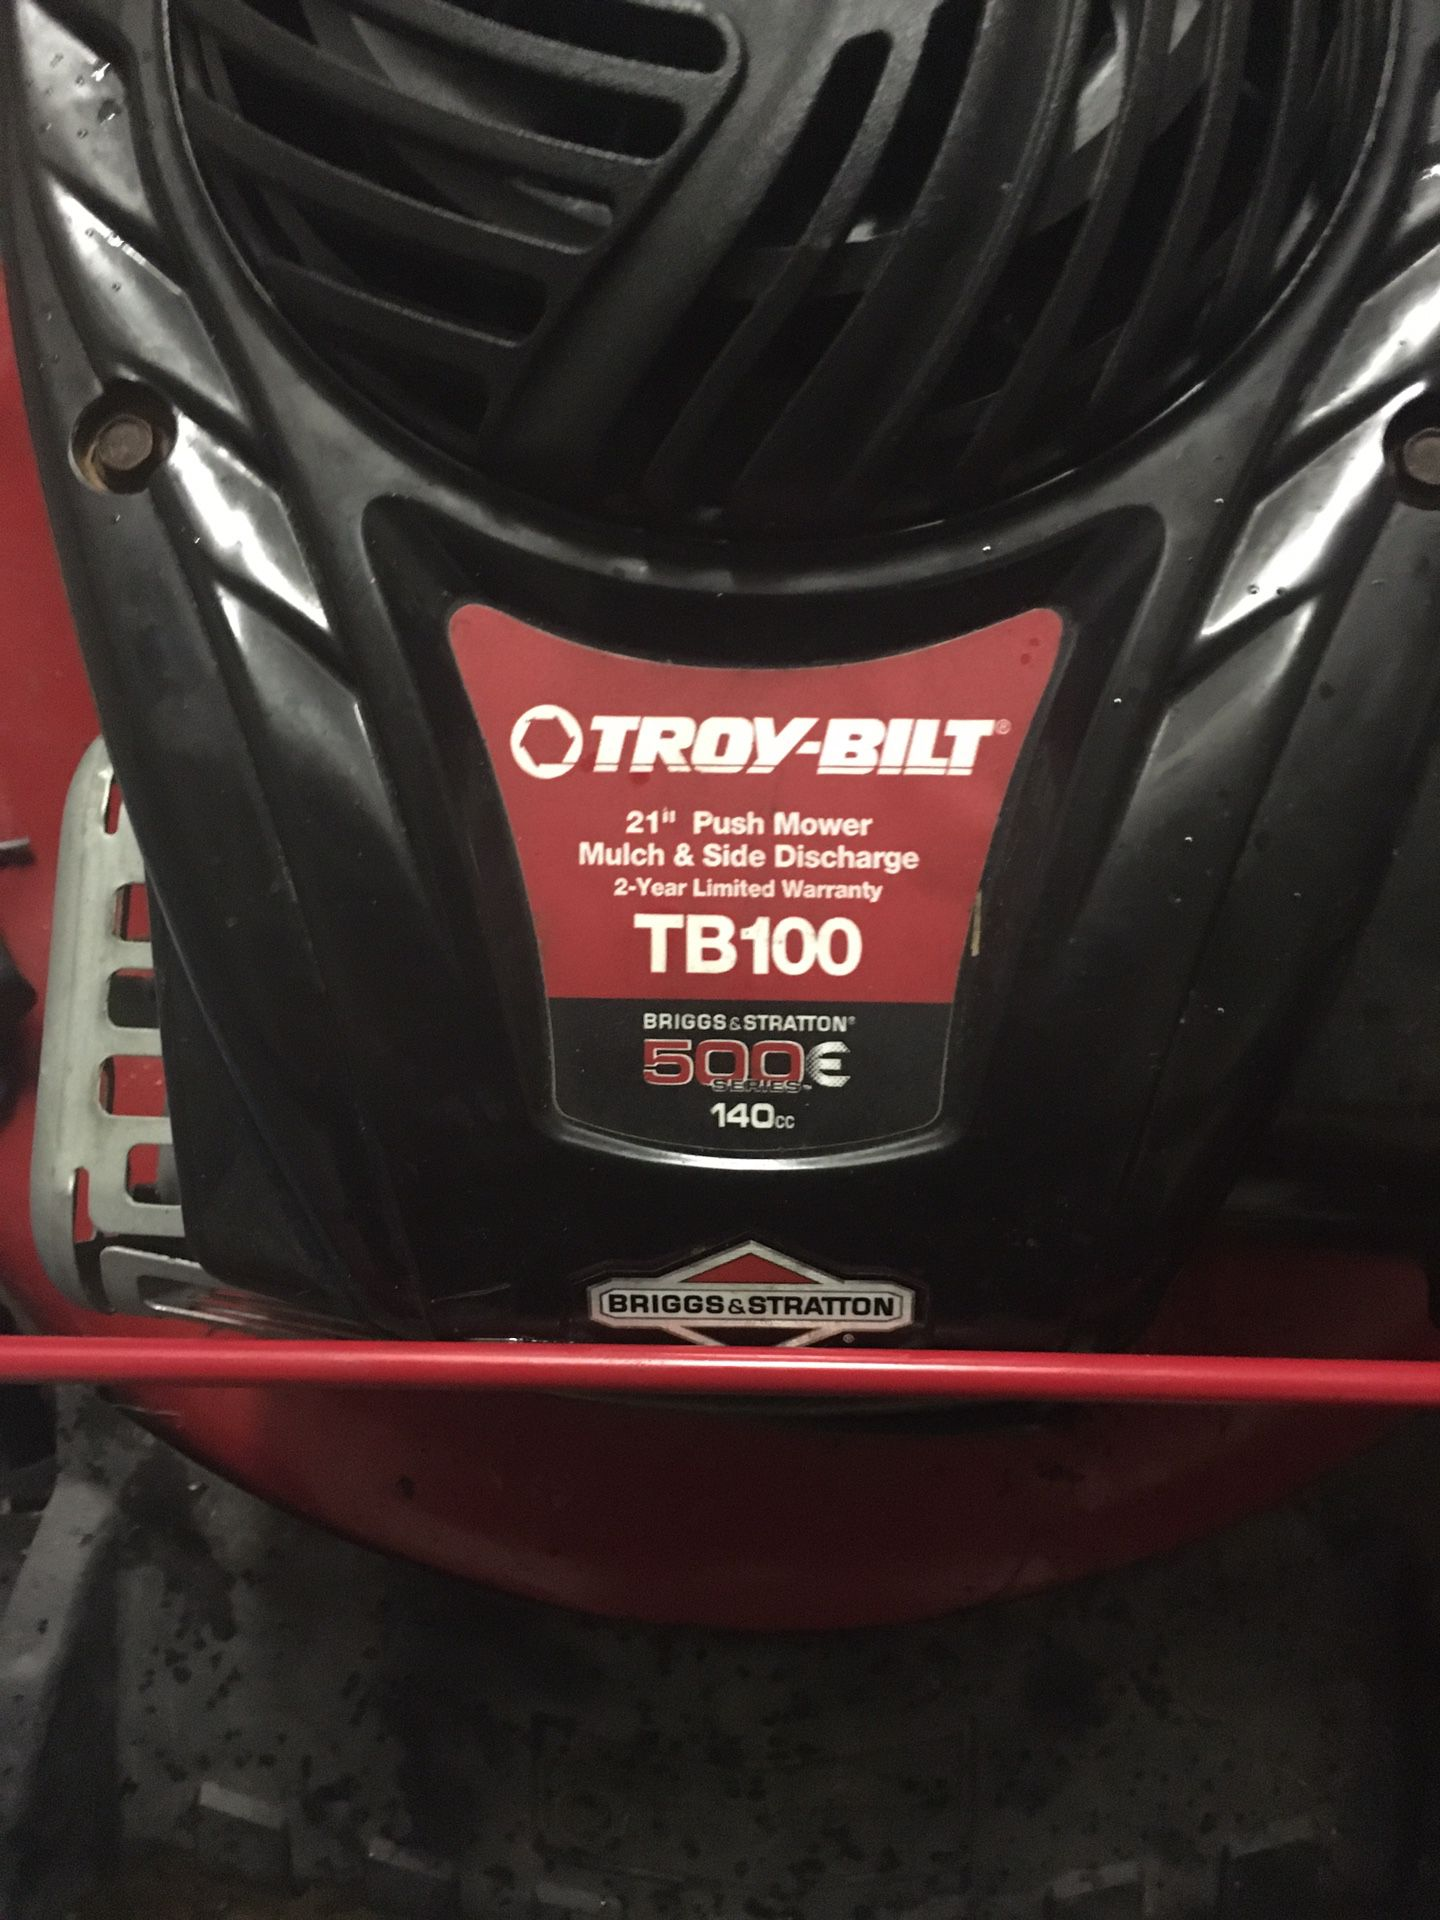 Troy Built , Lawnmower